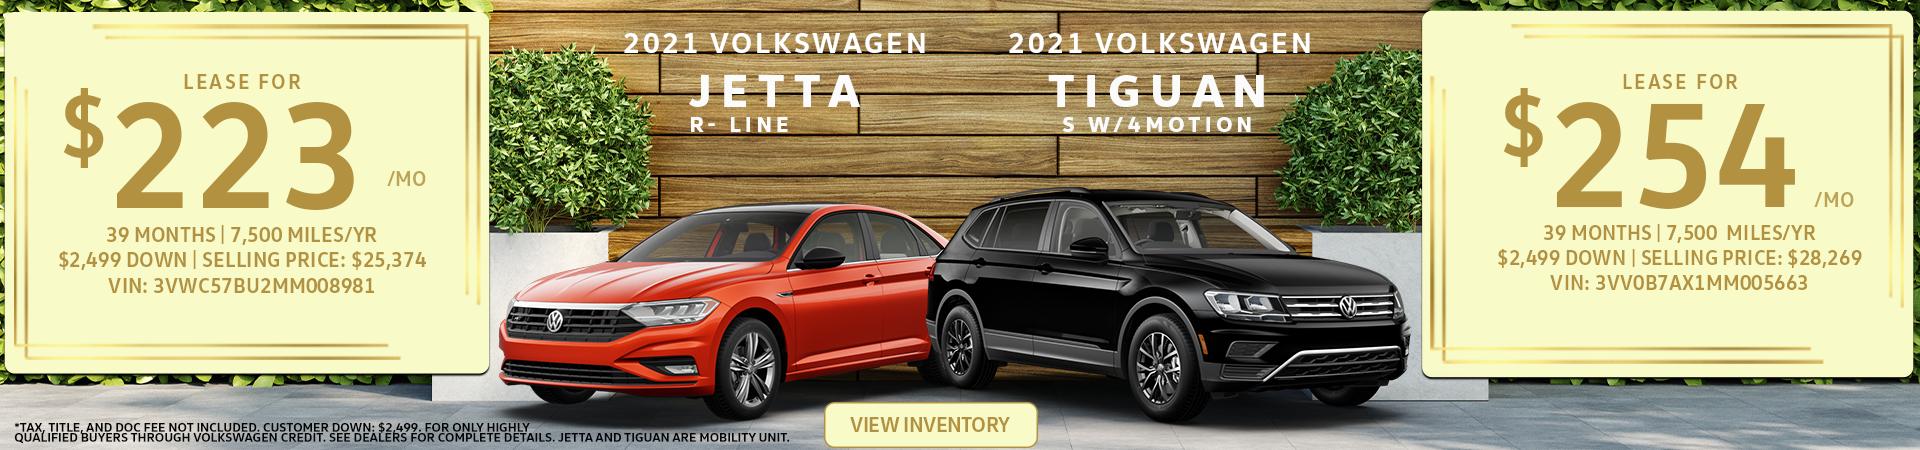 Jetta and Tiguan Eastside VW June 2021